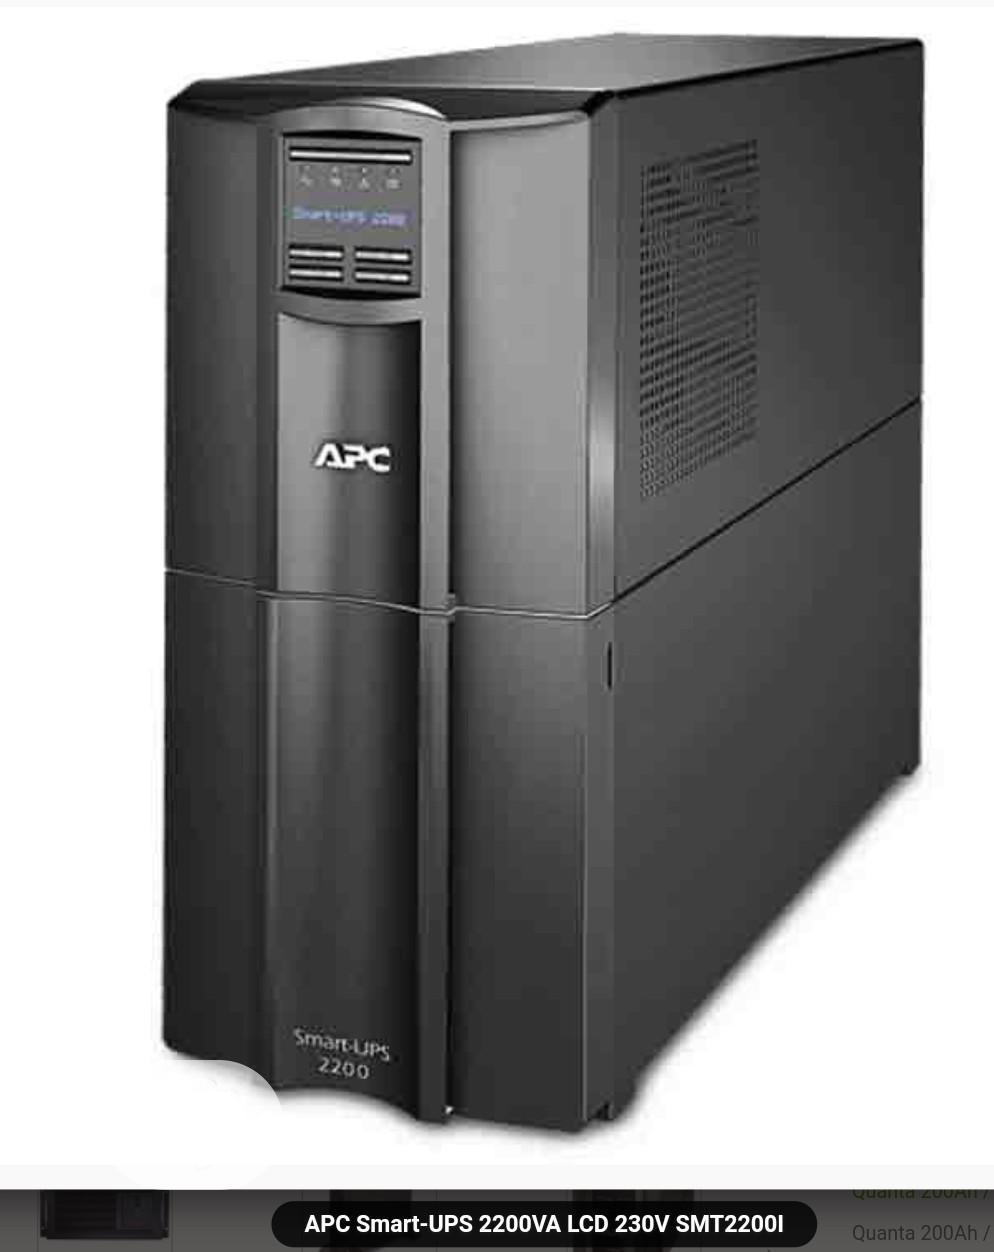 APC Smart-ups 2200va LCD 230V Smt2200i 1980 Watts /2200 Va,